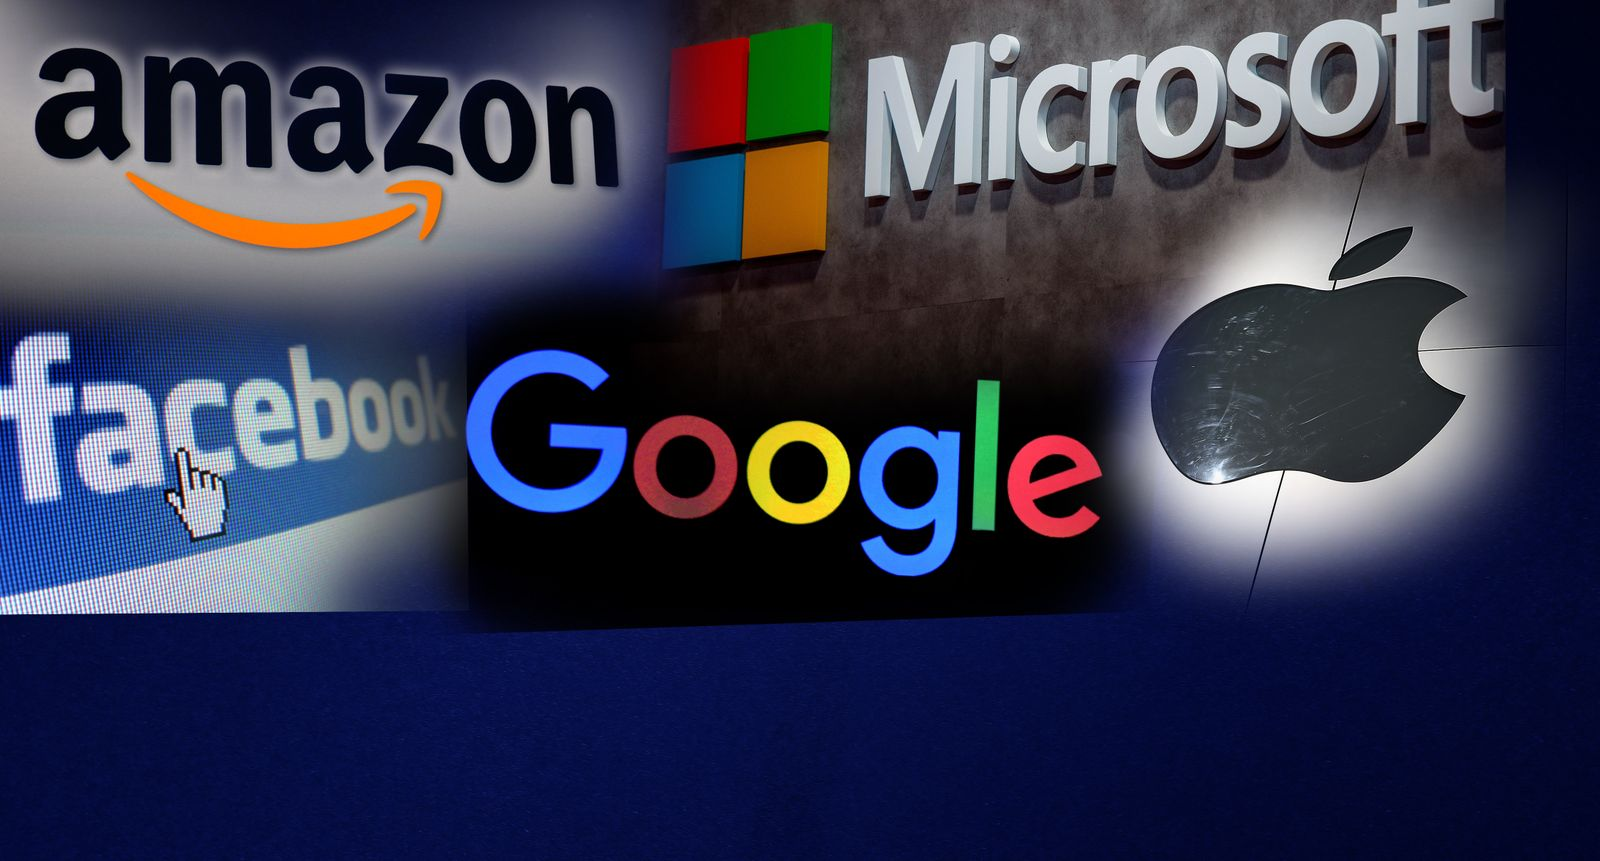 mazon /Microsoft / Google / Facebook / App